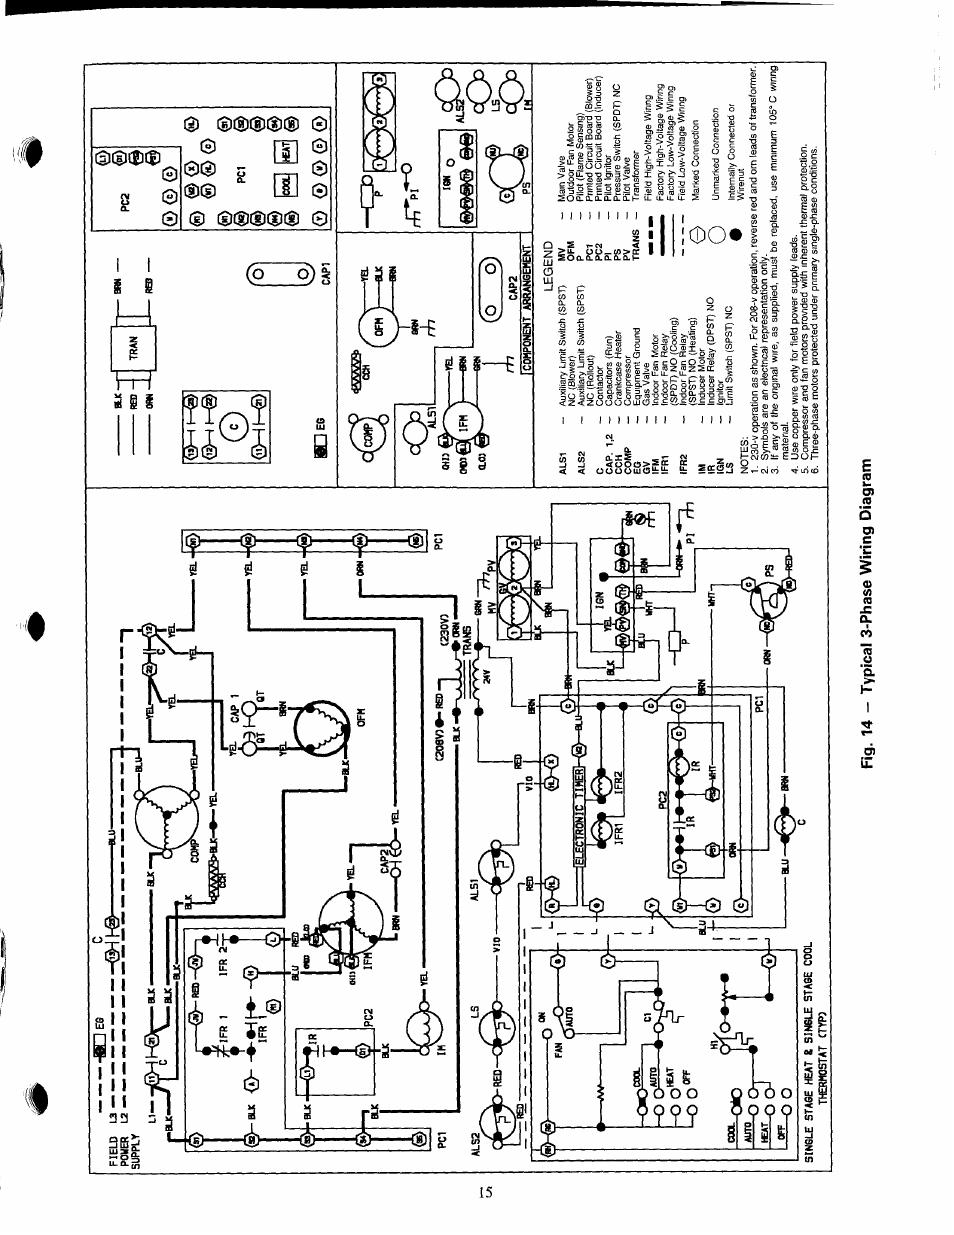 hight resolution of  rittenhouse door chime wiring diagram on rittenhouse intercom